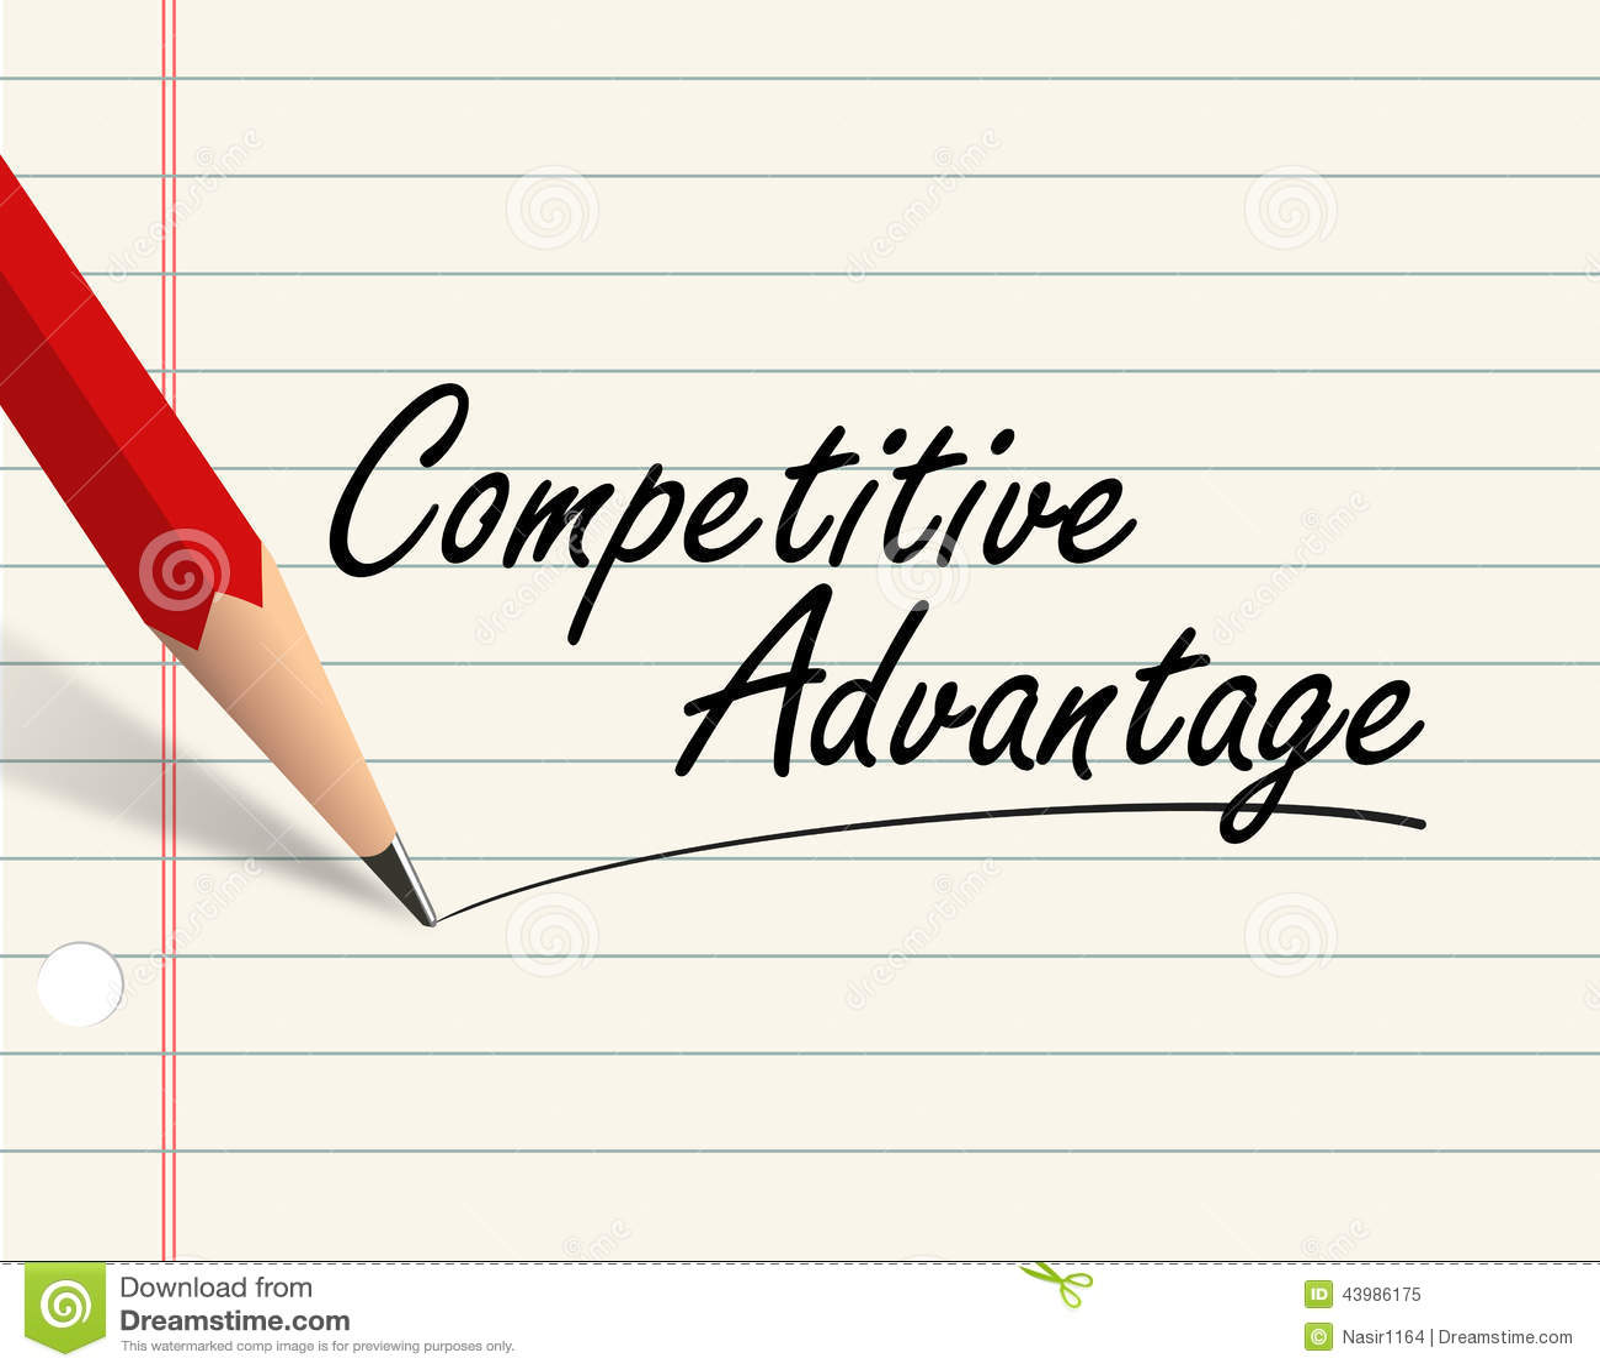 Competitive advantage essay